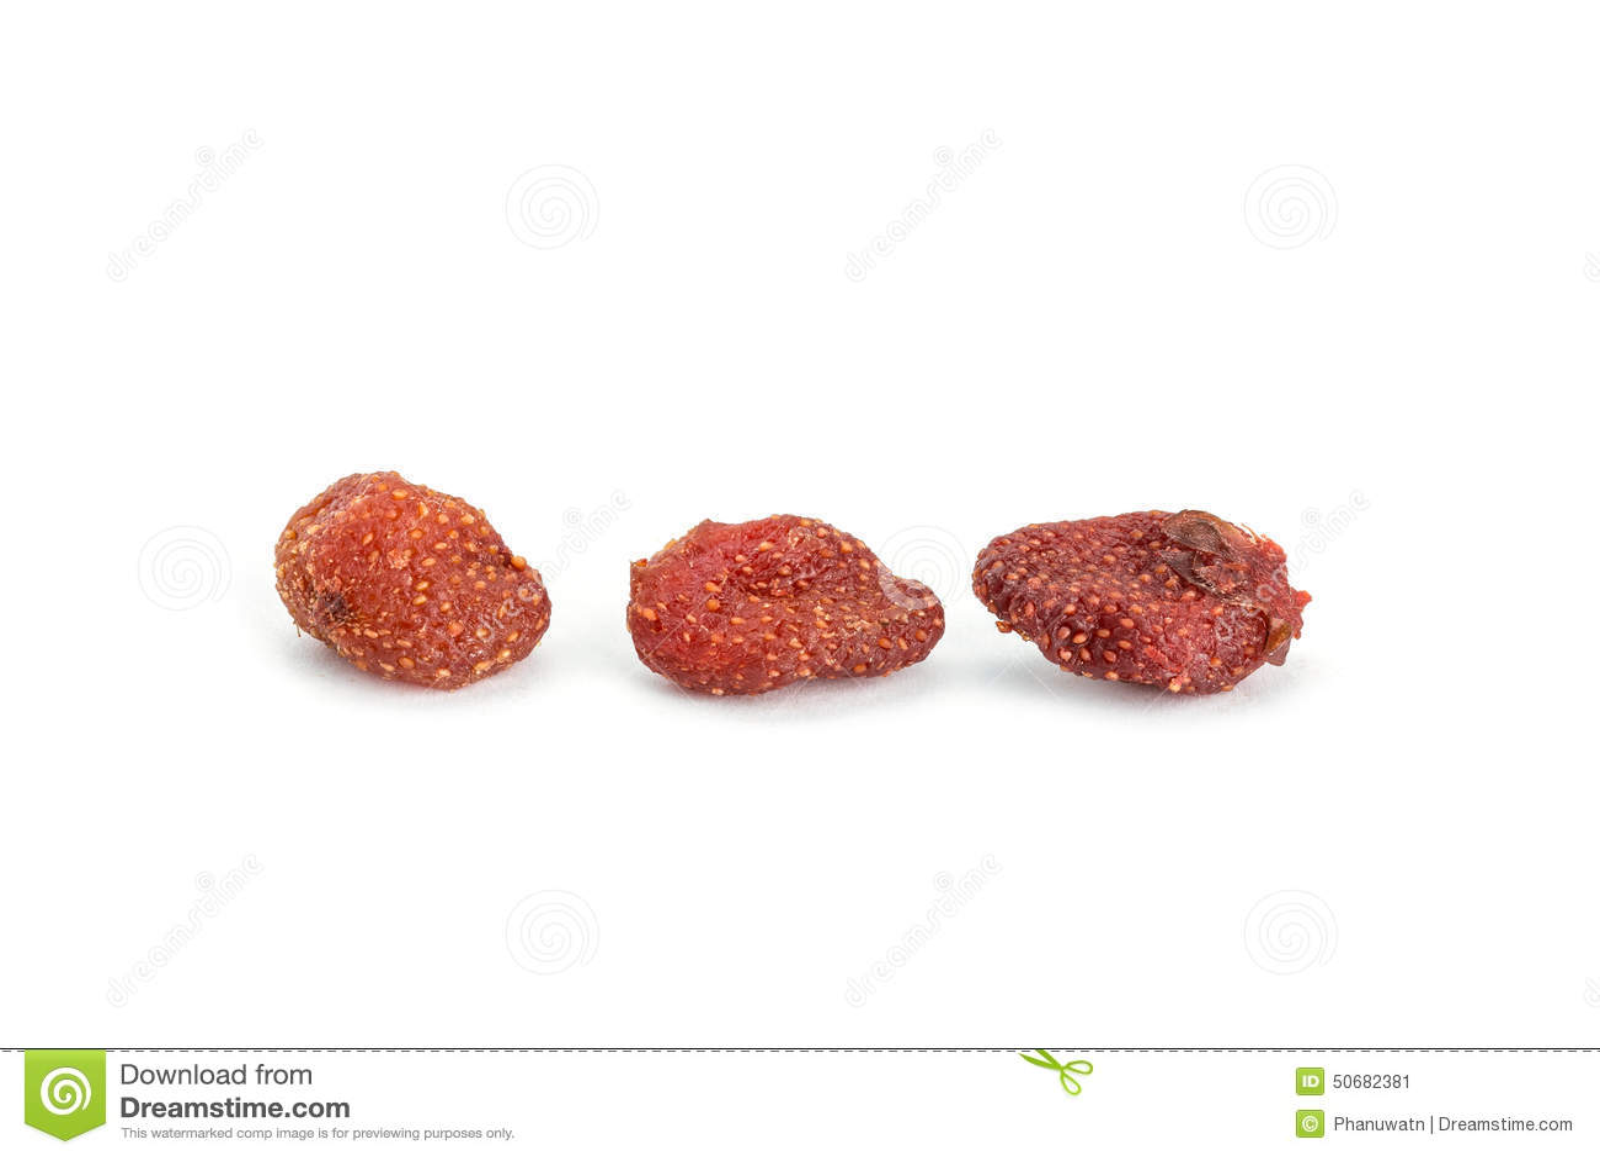 Download 烘干草莓 库存图片. 图片 包括有 干燥, 食物, 营养, 果子, 健康, 对象, 查出, 草莓, 纹理 - 50682381